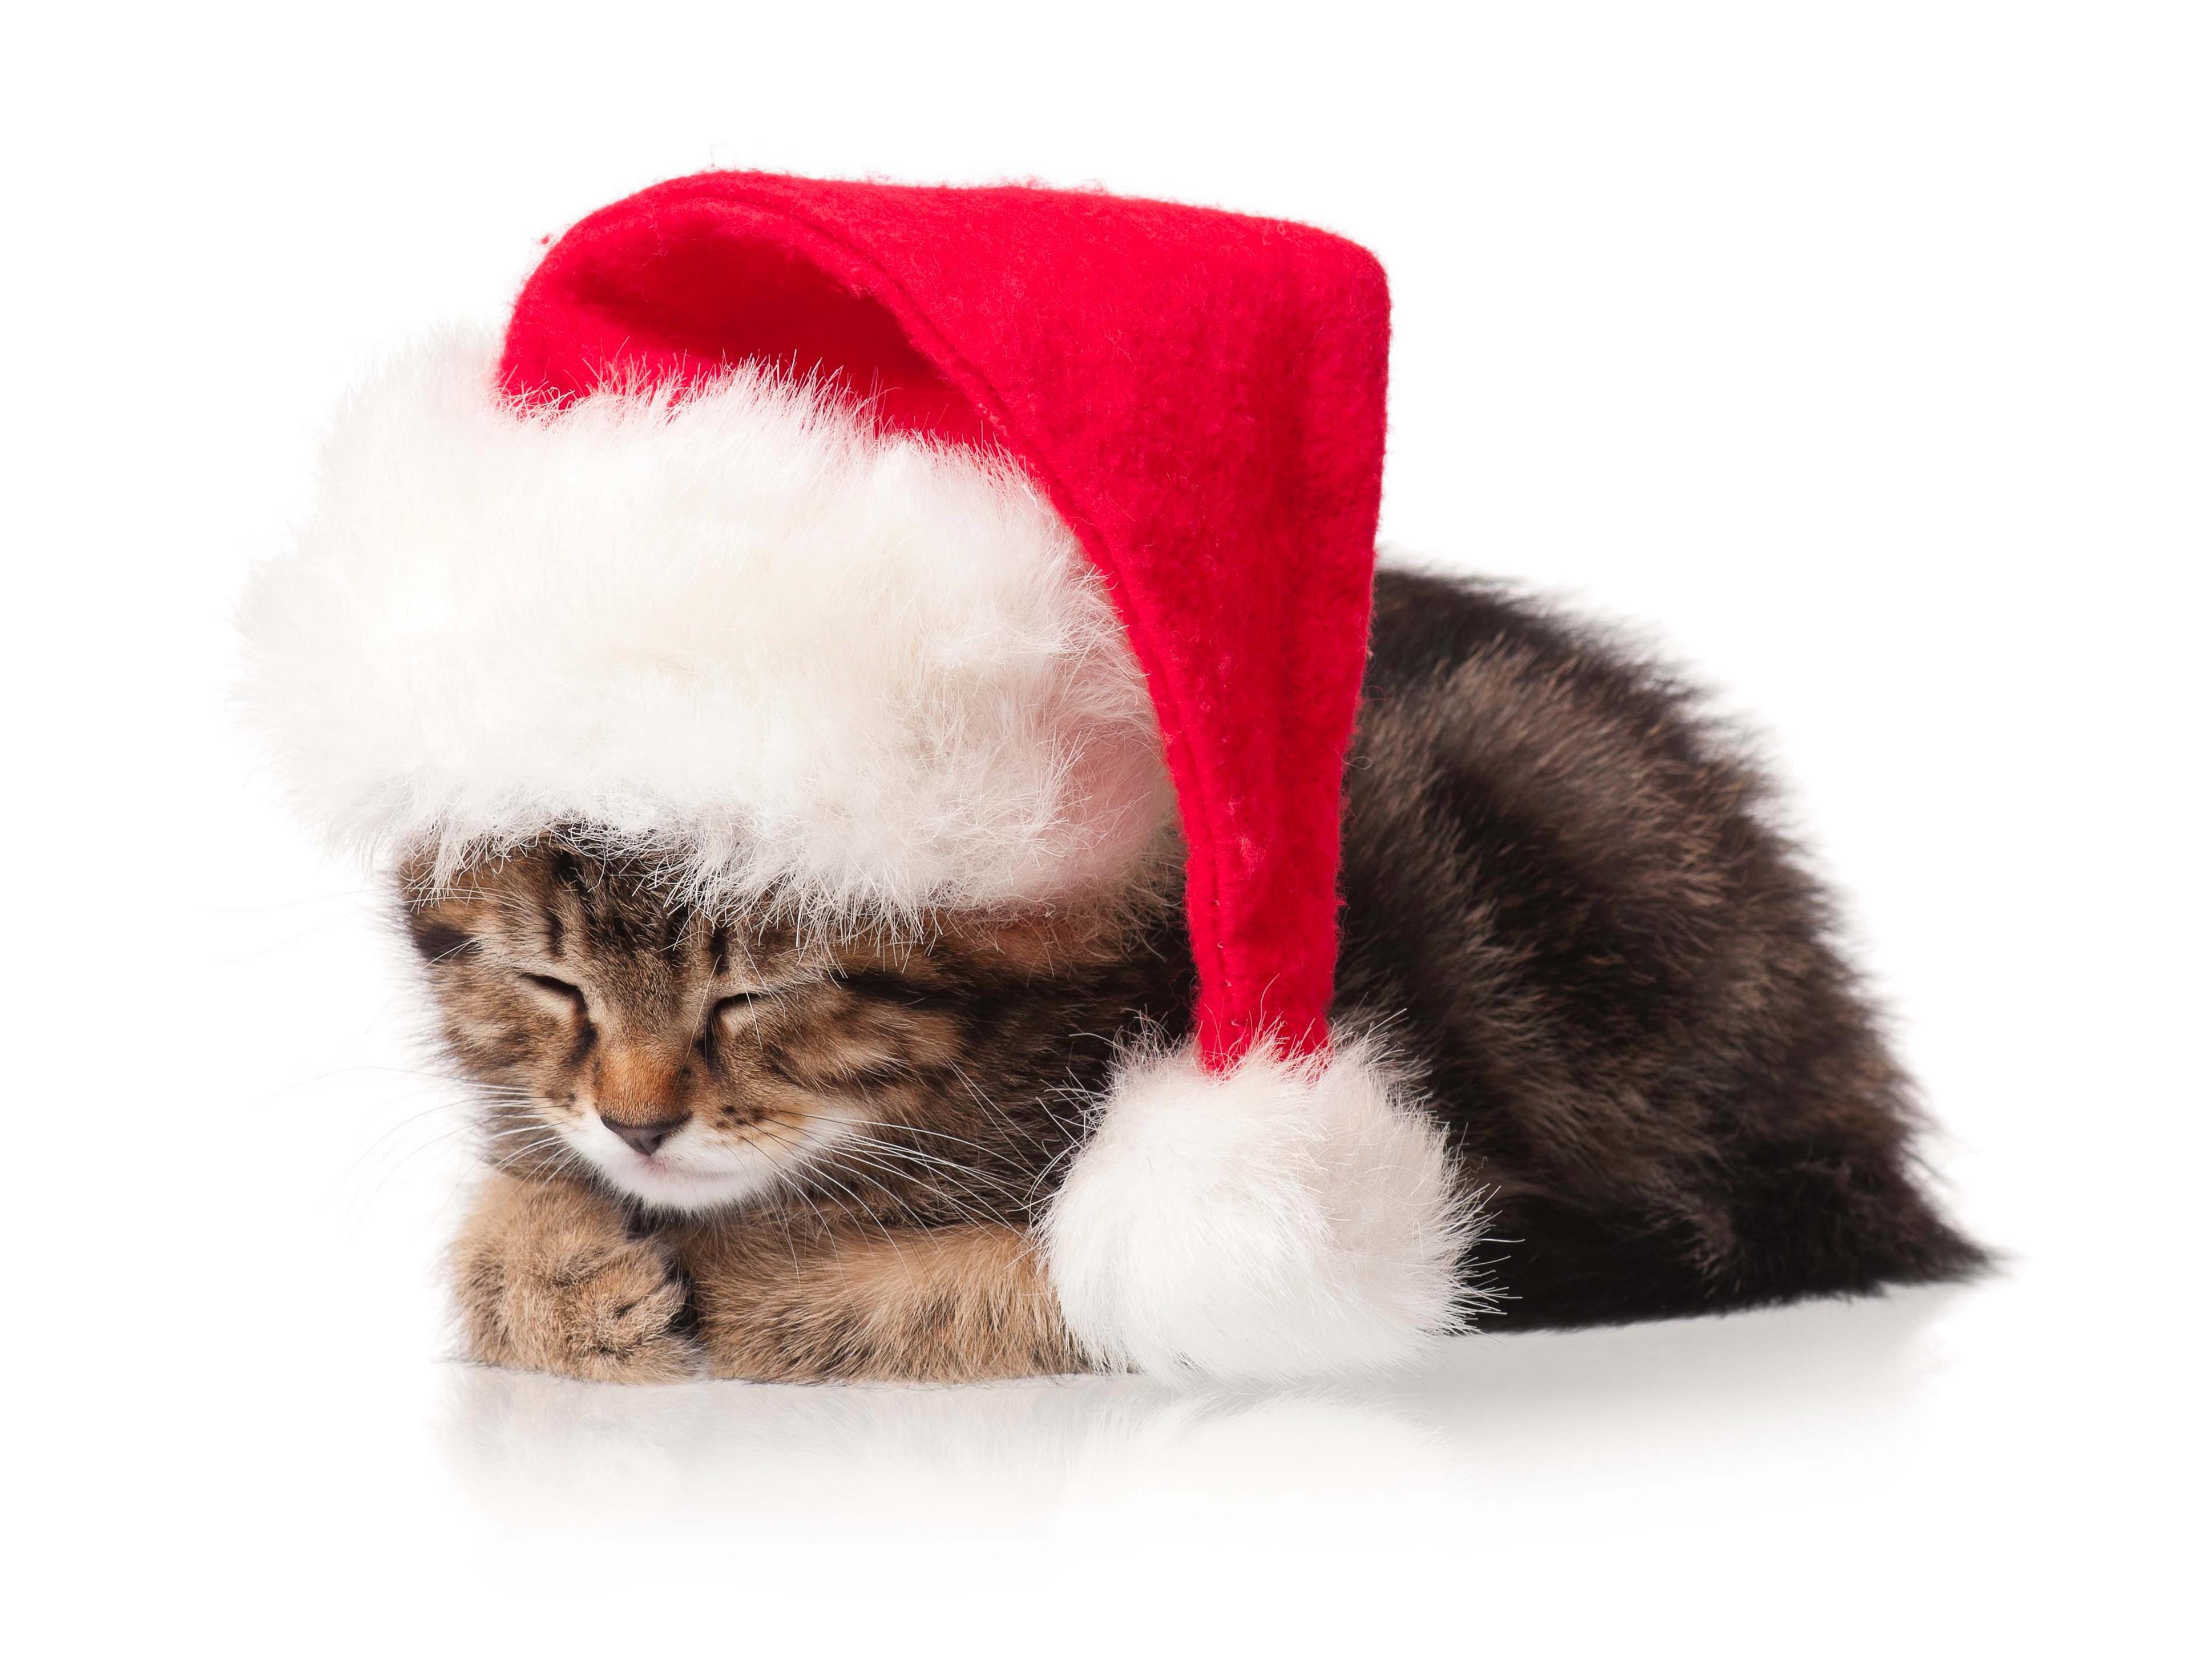 Cat in the Hat Wallpaper 3876x2908